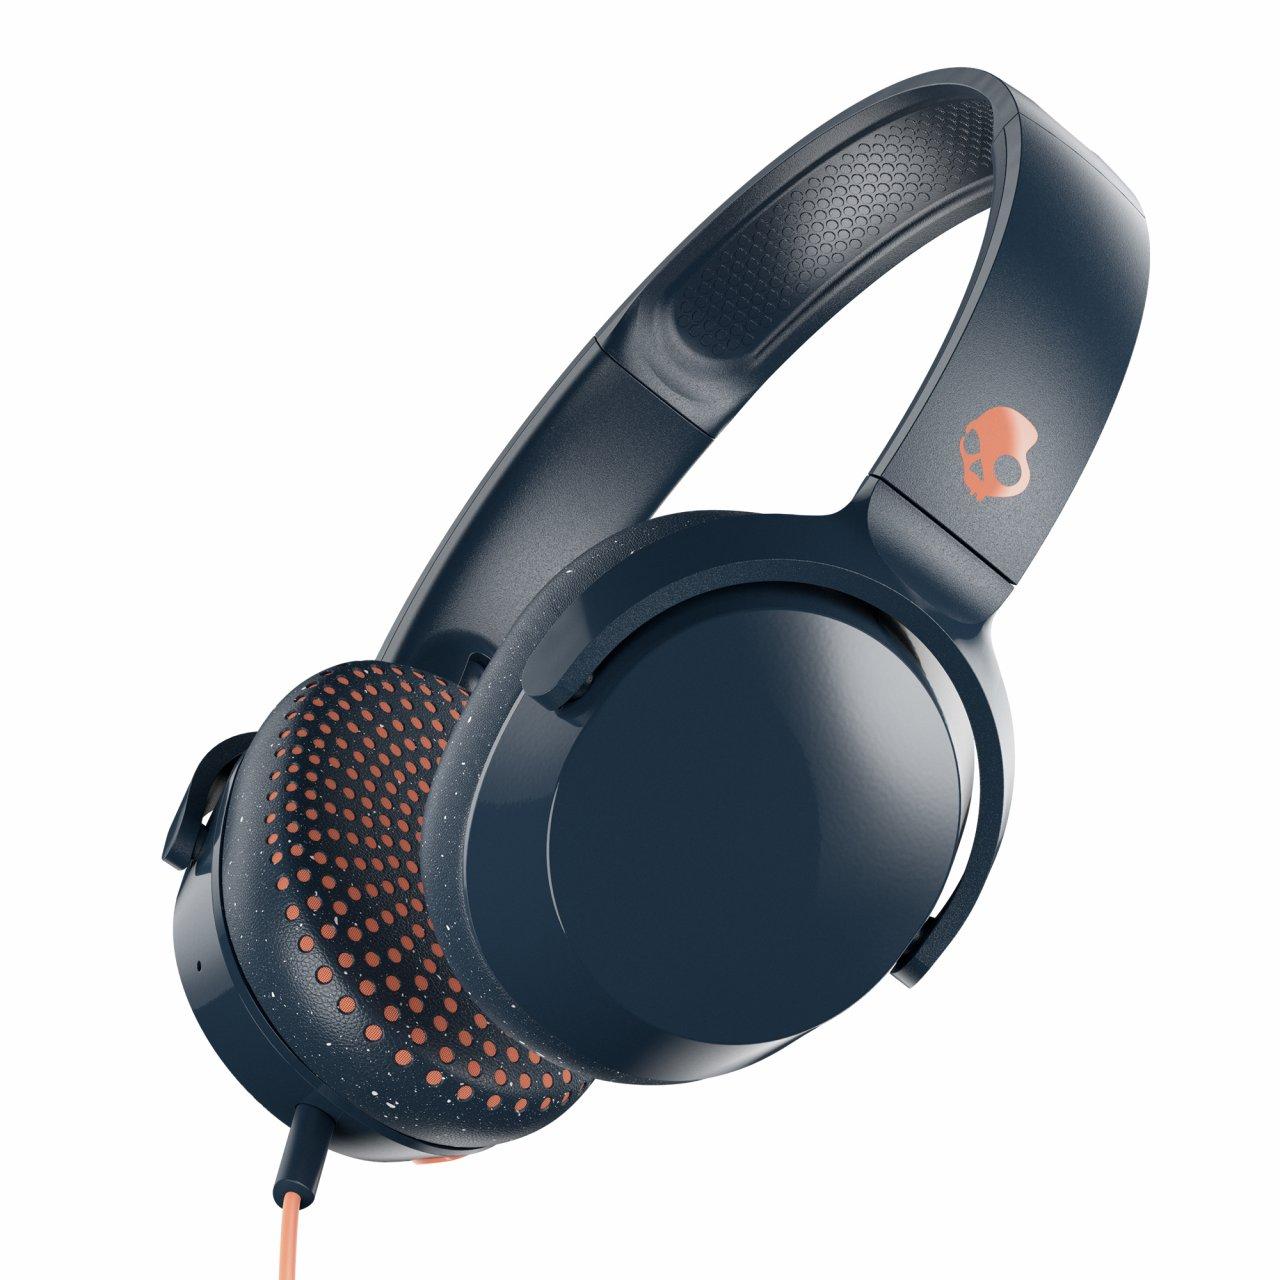 maquinilla de afeitar Tristemente Subordinar  Skullcandy Riff On-Ear Collapsible Wired Headphones